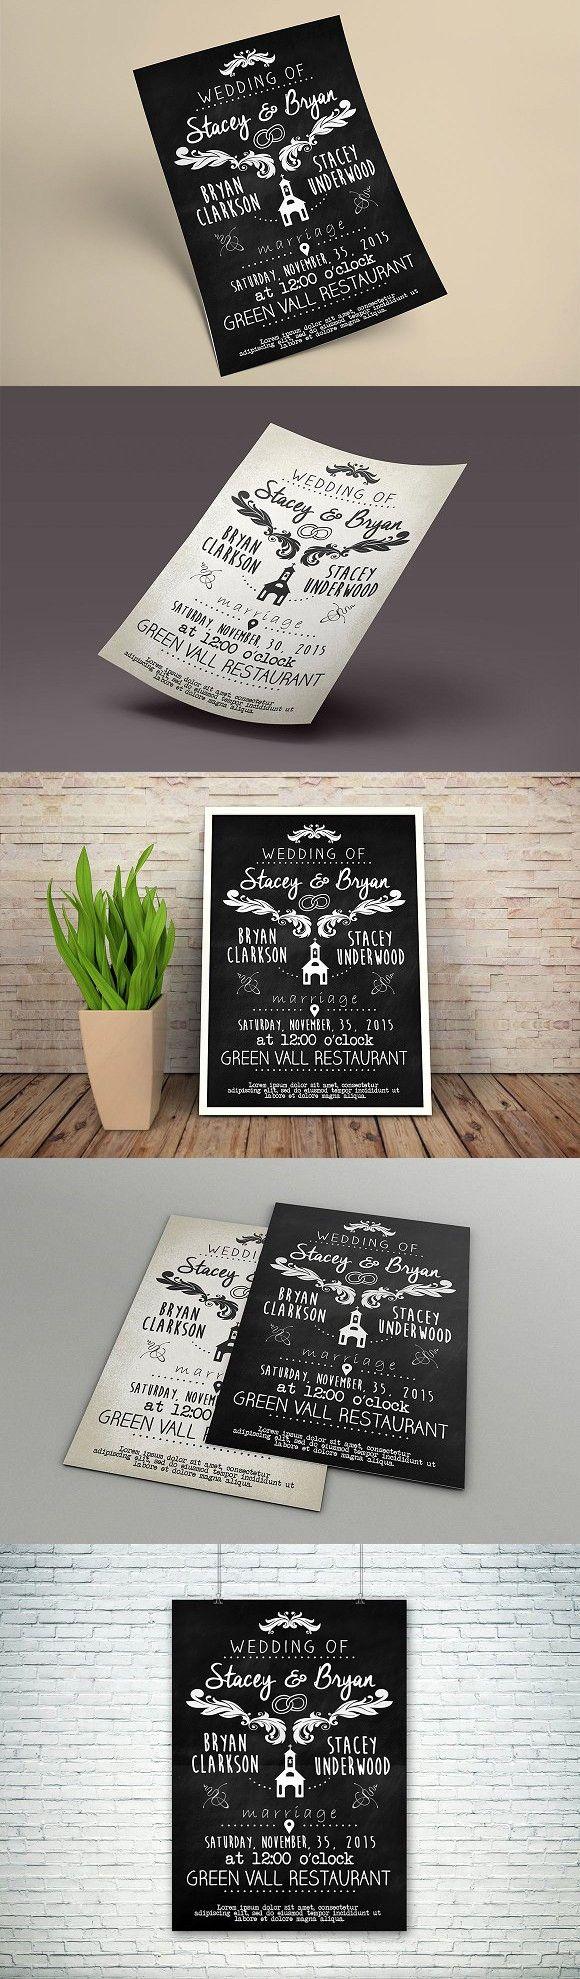 Facebook Wedding Invitation Templates Picture Ideas References - Wedding invitation templates: facebook wedding invitation template